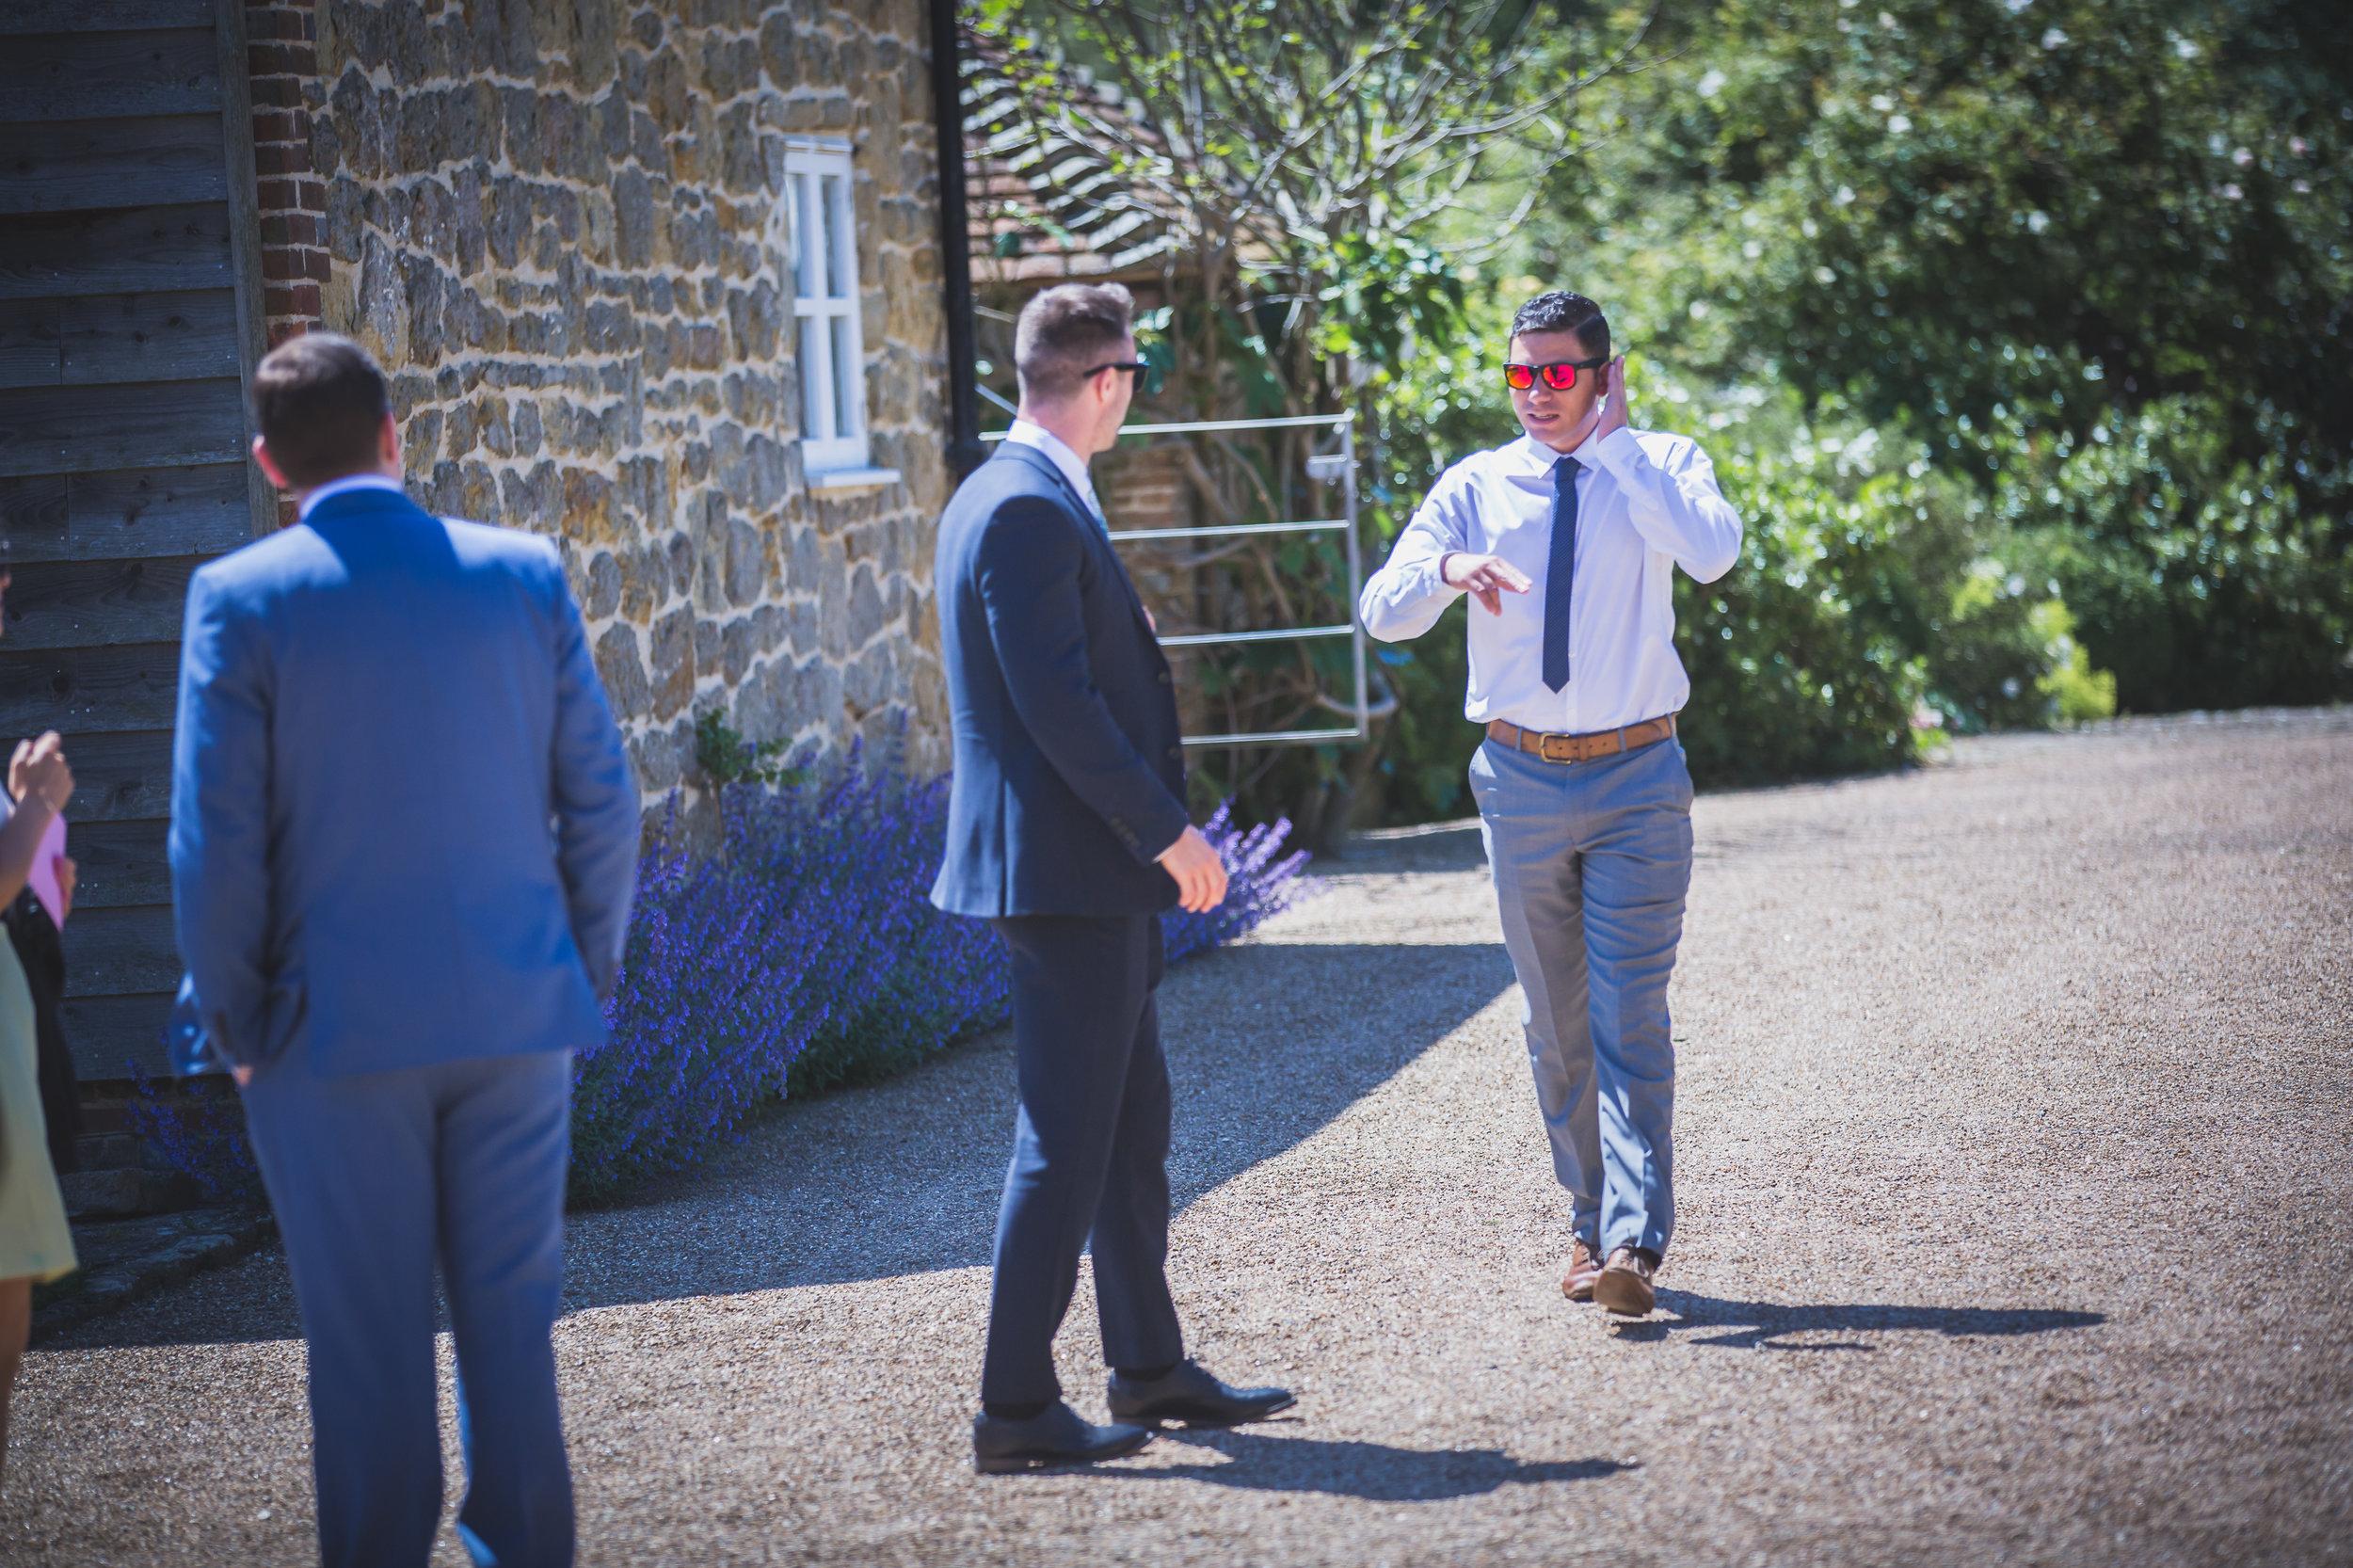 Grittenham Barn female wedding photographers west sussex petworth social-32.jpg